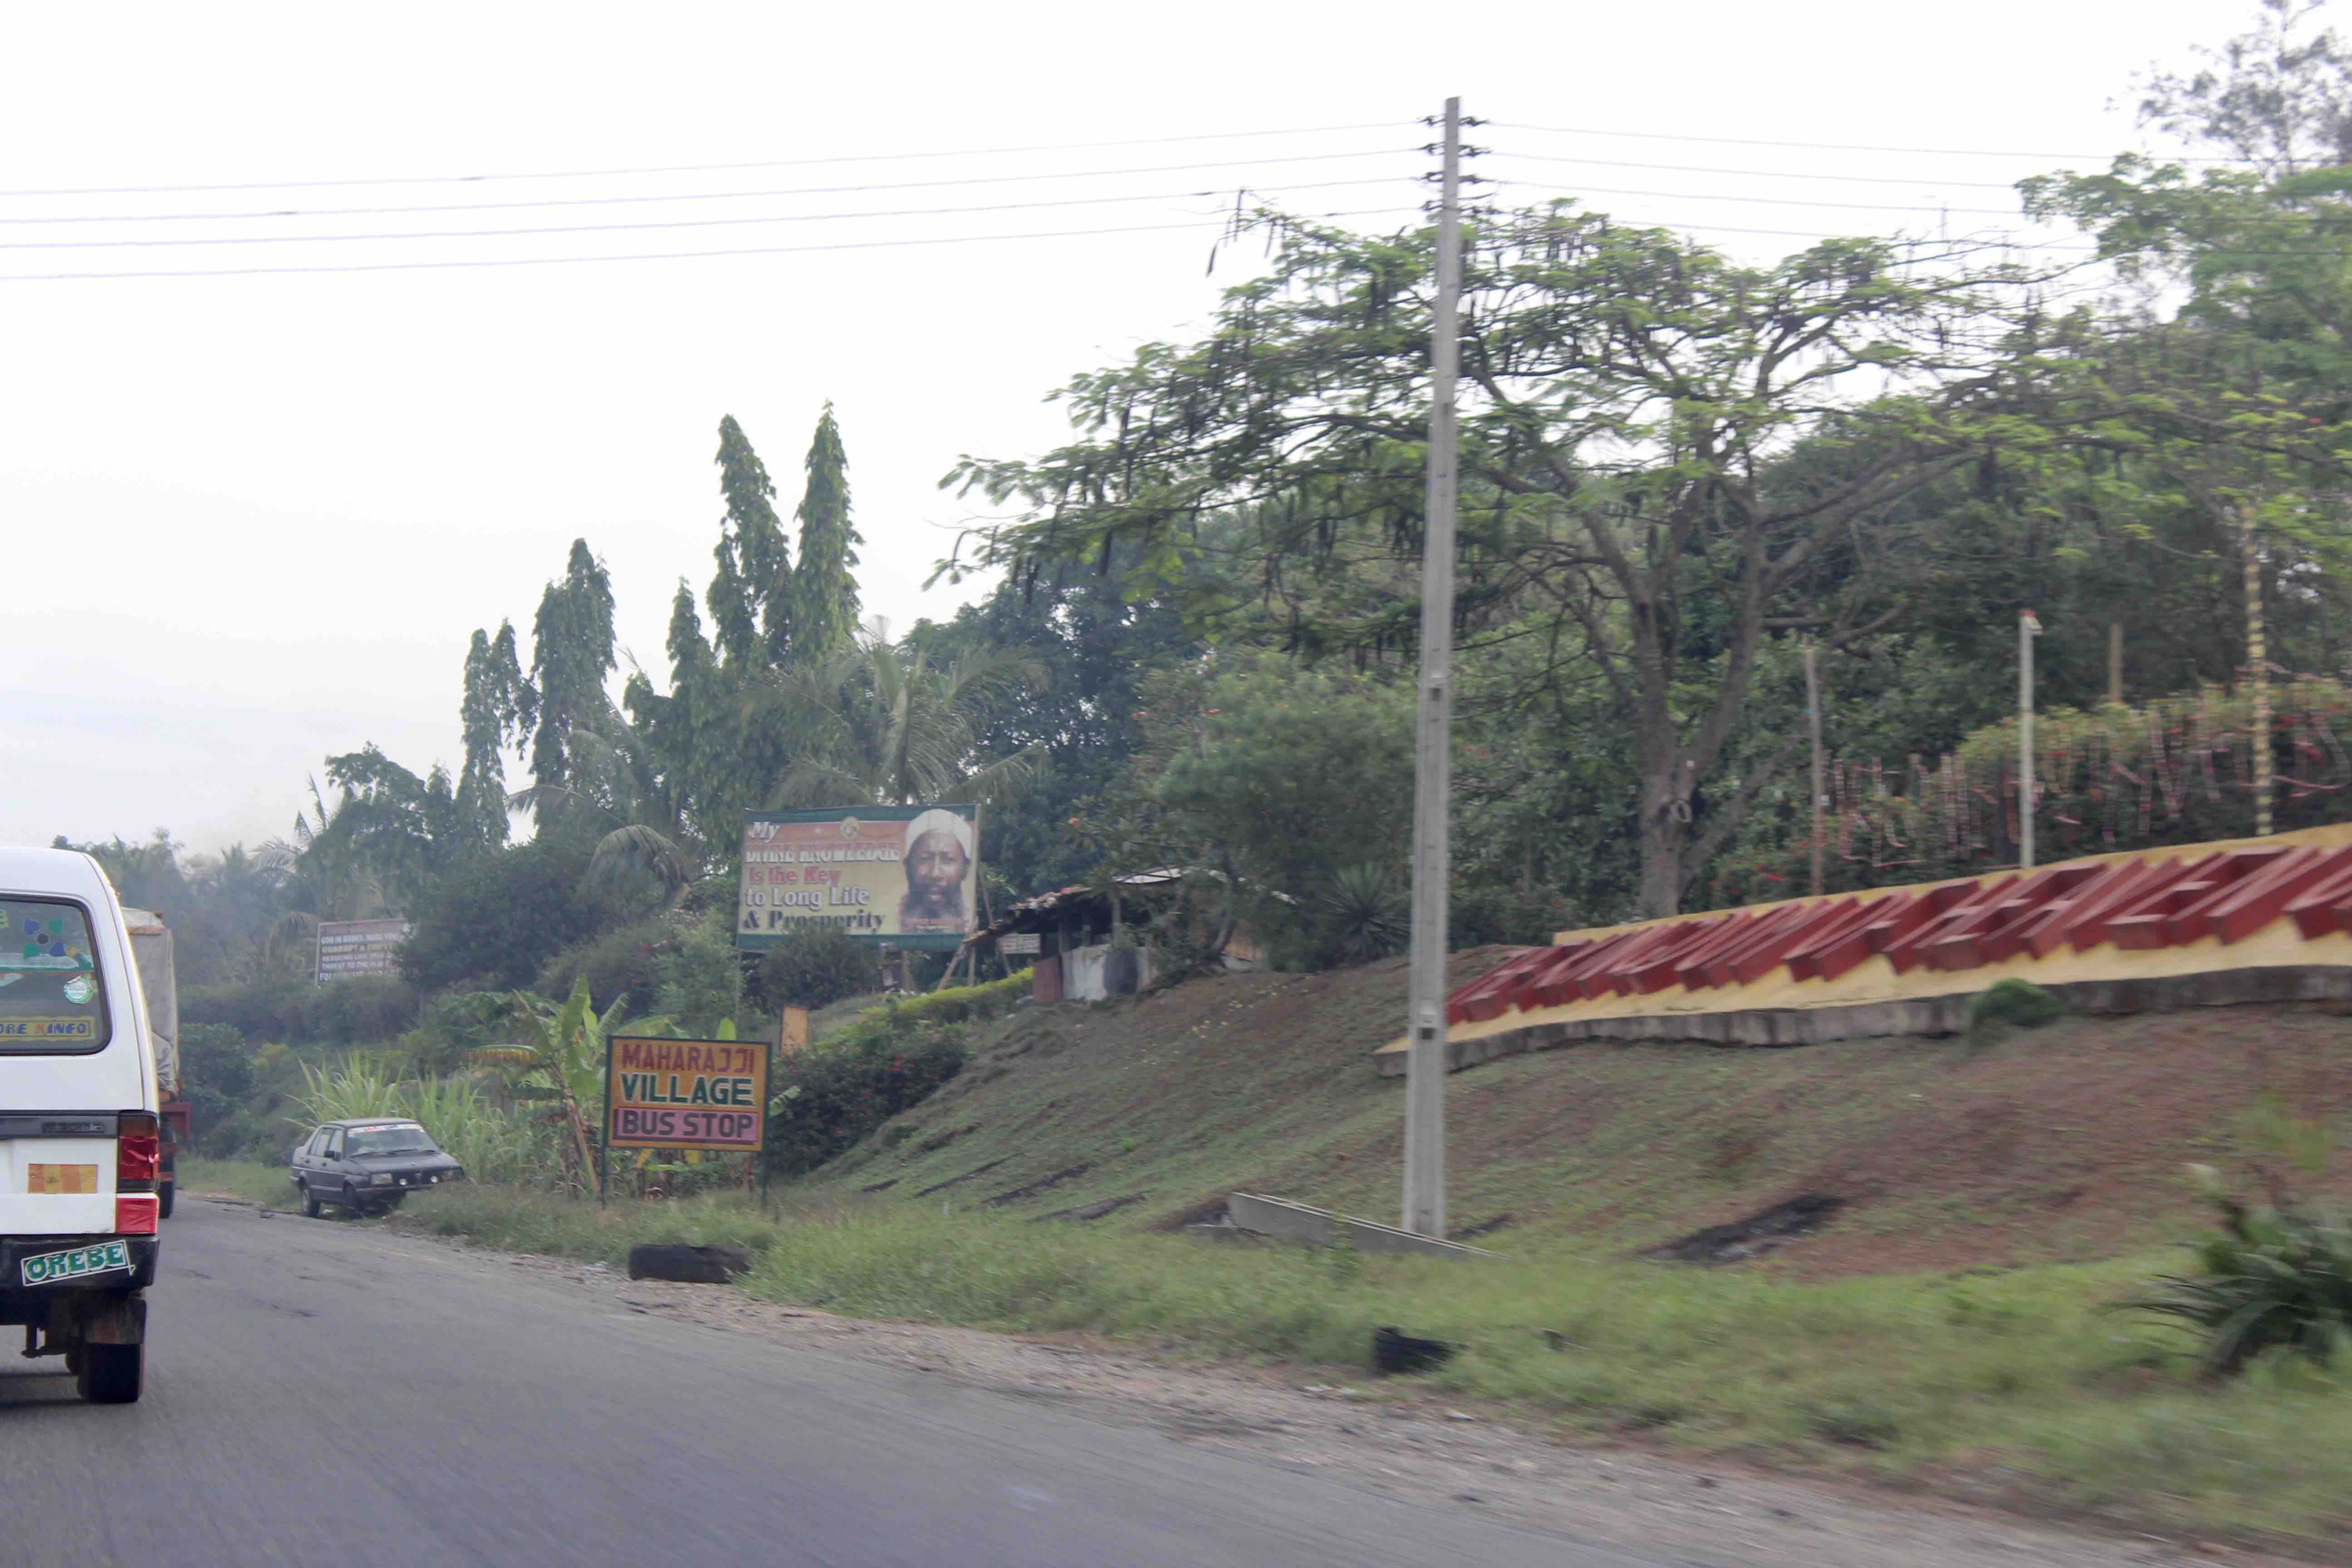 Guru Maharaj Ji Bus Stop, Lagos-Ibadan Expressway, Ibadan, Oyo State, Nigeria. #JujuFilms